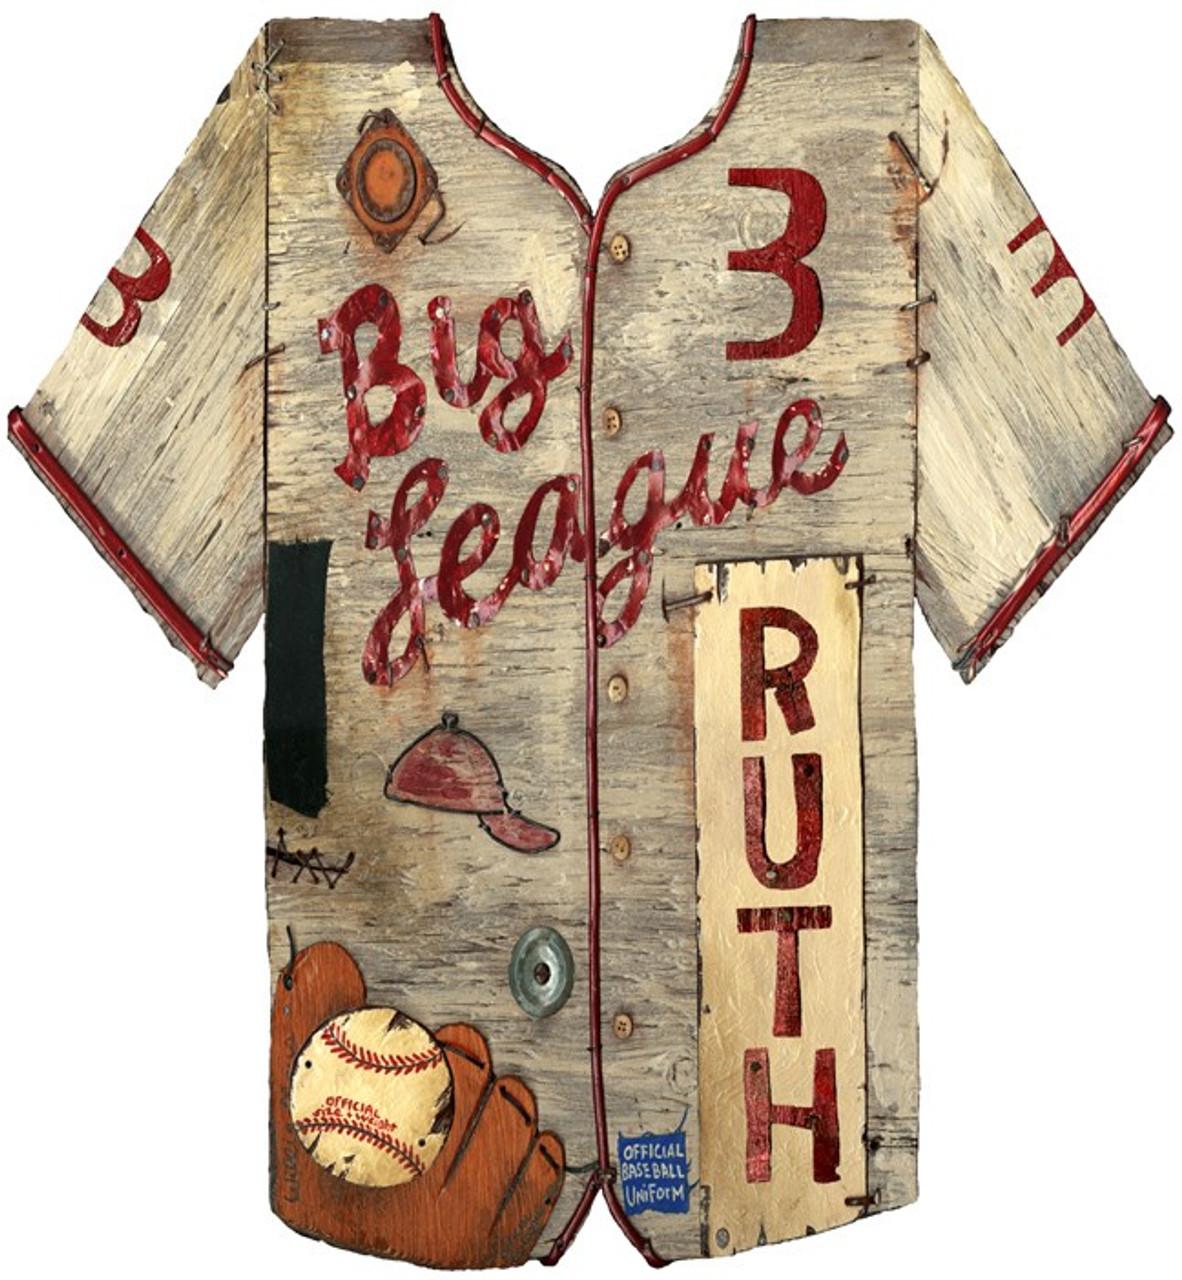 c74fffff707 Vintage Baseball Jersey Sign | Rustic Baseball Décor